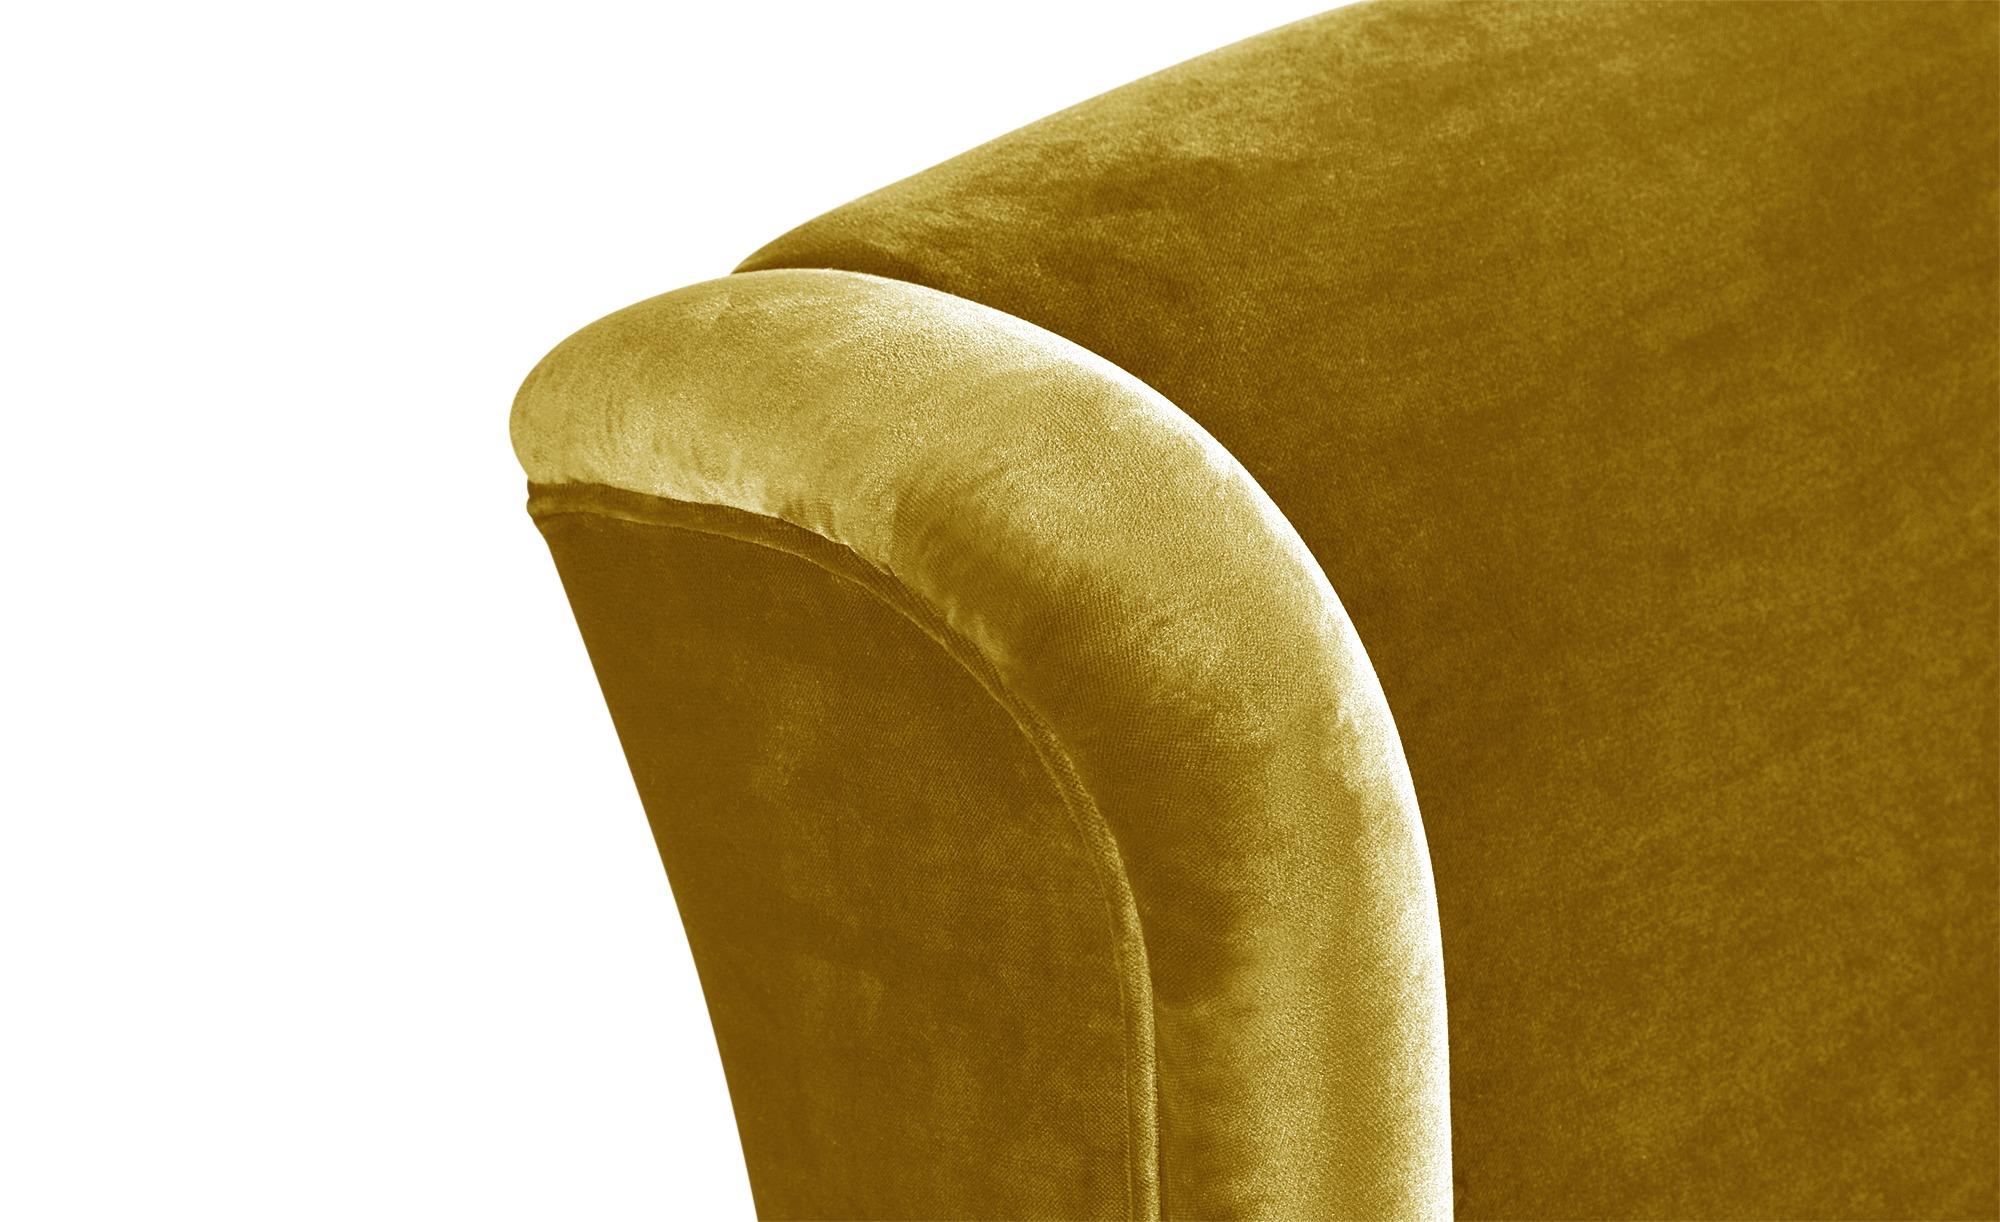 smart Ohrensessel gelb - Stoff Charmaine ¦ gelb ¦ Maße (cm): B: 84 H: 98 T: 85 Polstermöbel > Sessel > Ohrensessel - Höffner